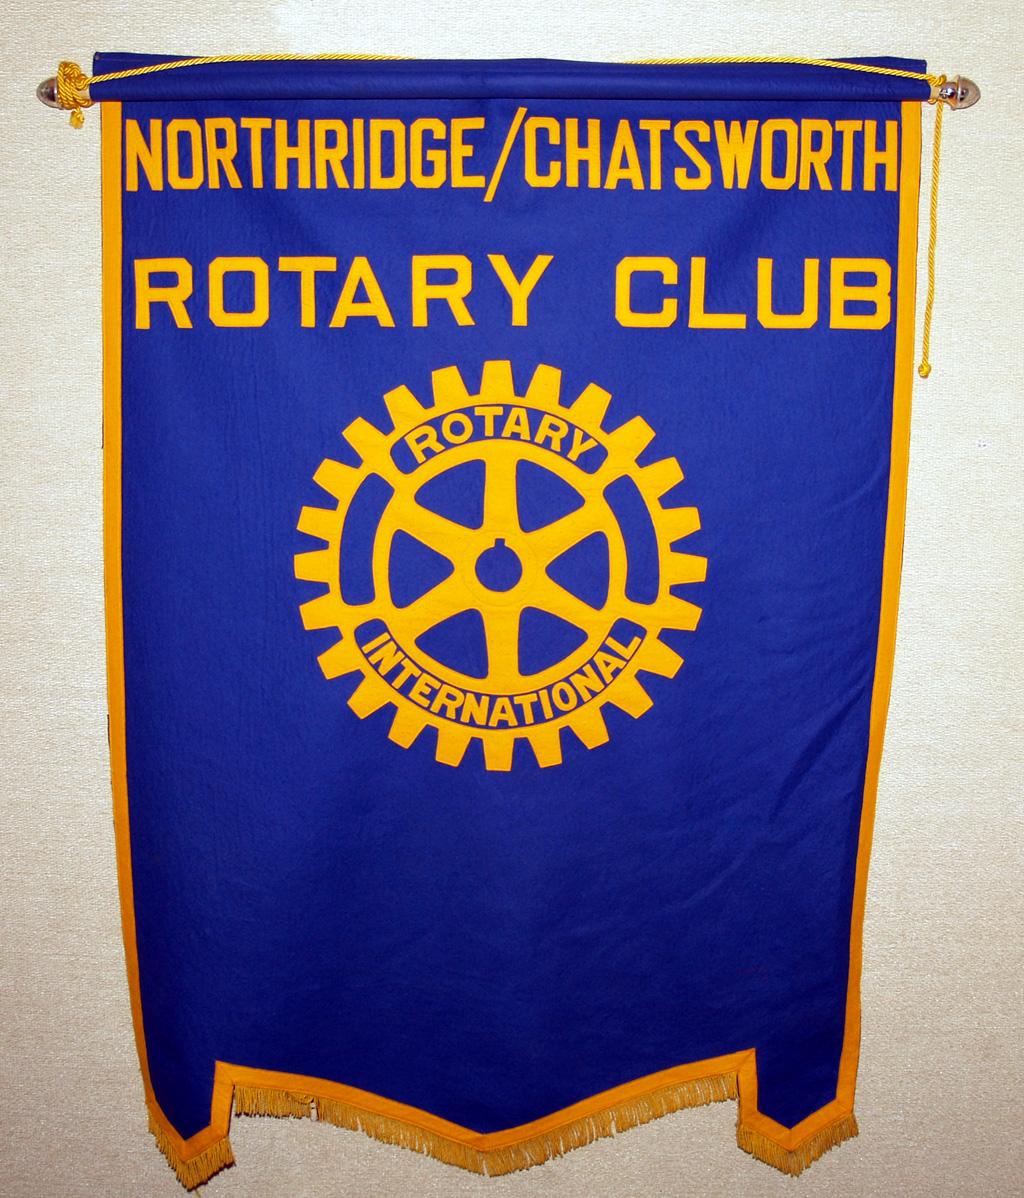 Northridge Chatsworth Rotary Club